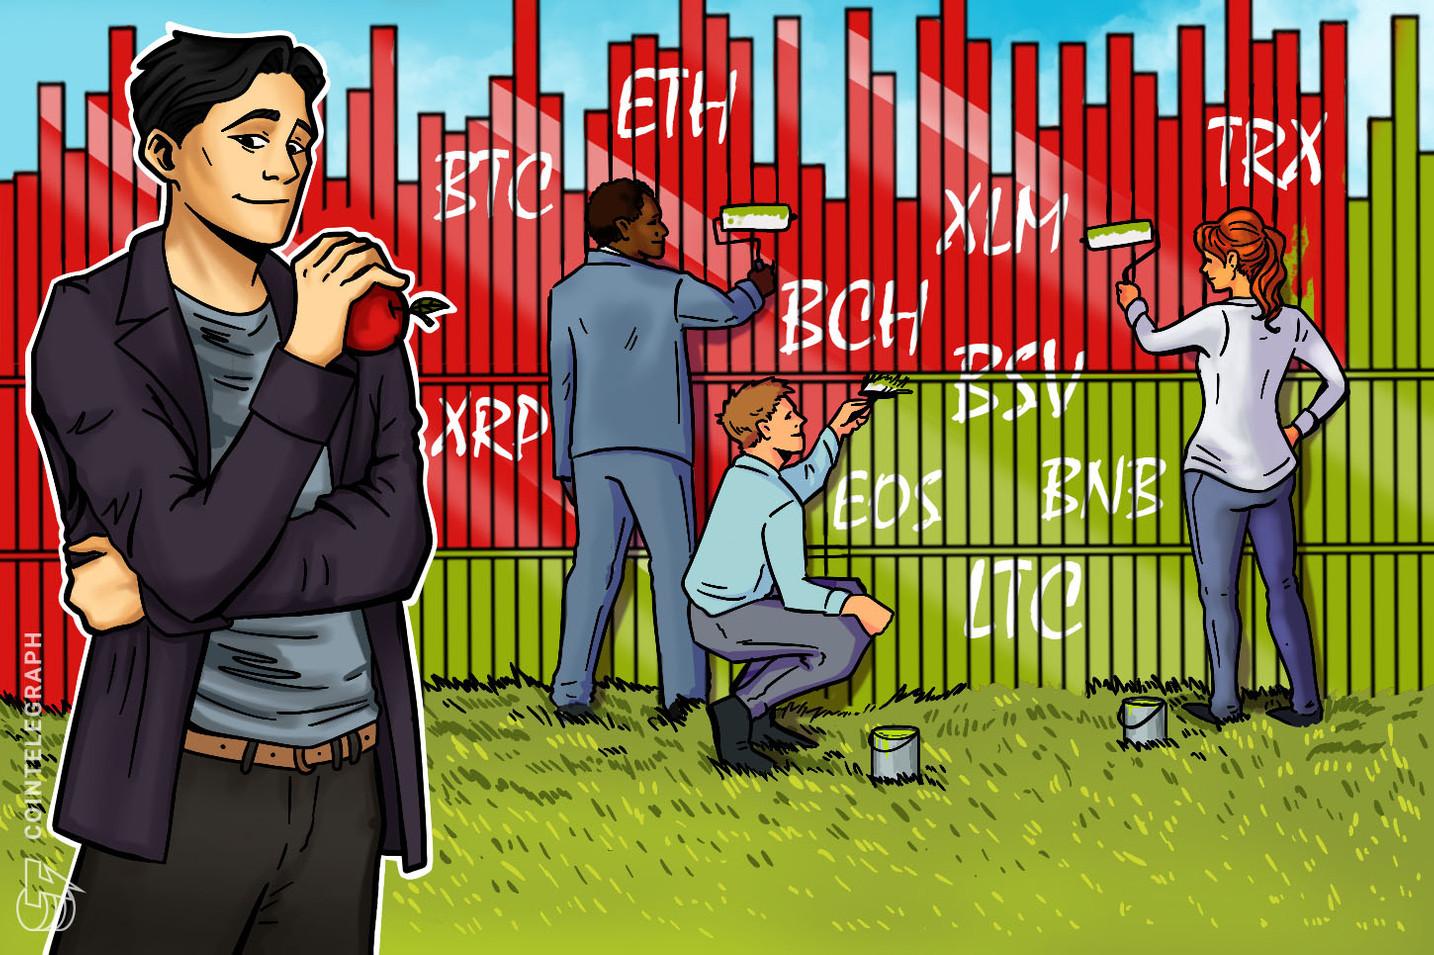 Price Analysis 02/12: BTC, ETH, XRP, BCH, LTC, EOS, BNB, BSV, XLM, TRX